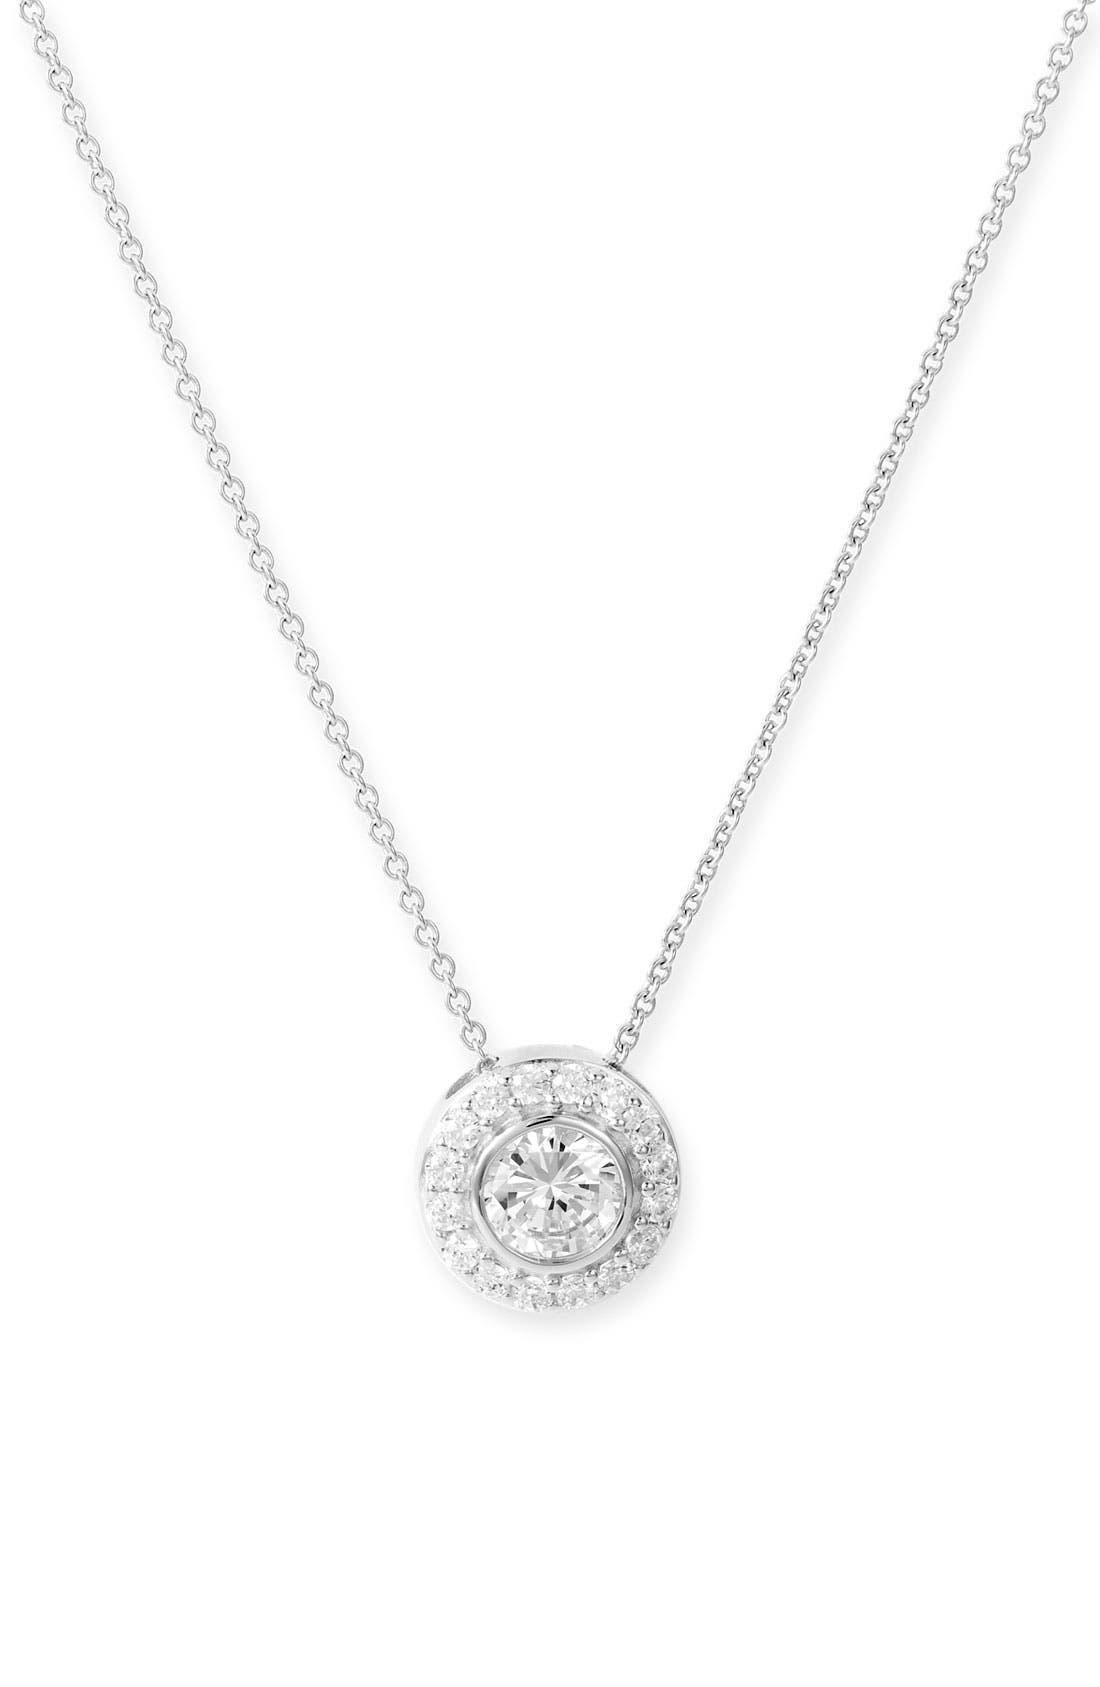 Alternate Image 1 Selected - Nordstrom Bezel Pendant Necklace